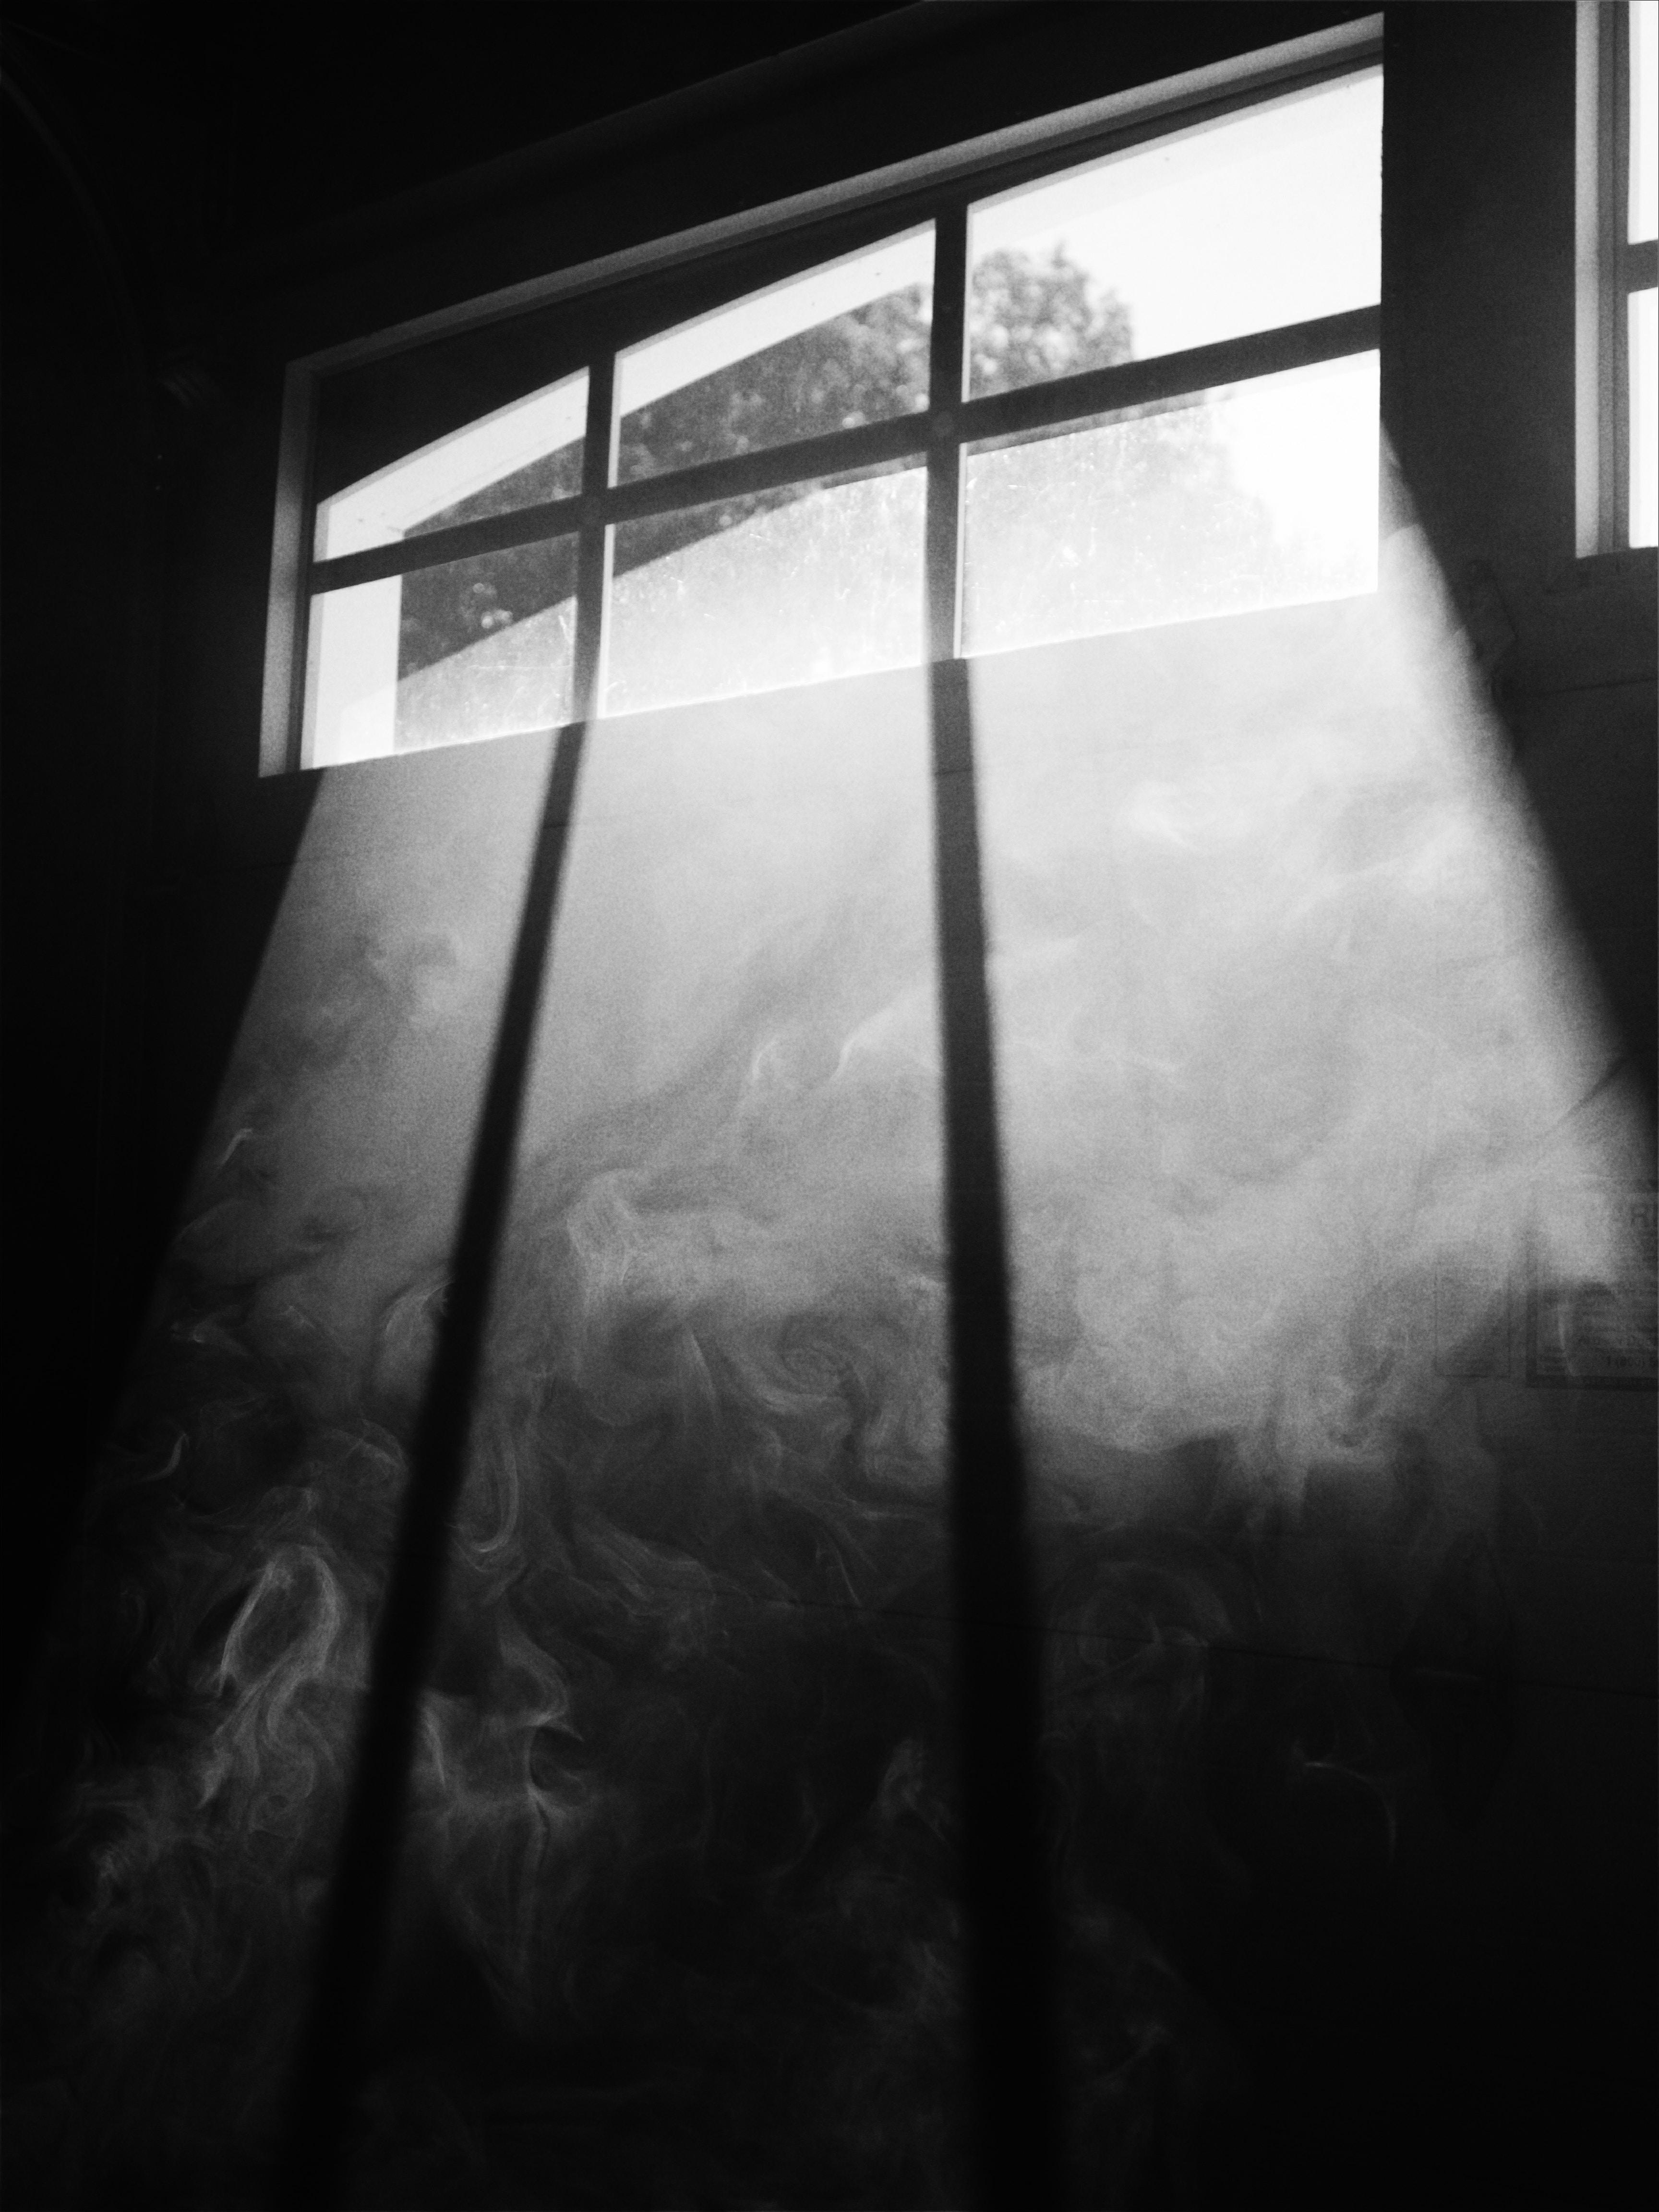 Smoky window